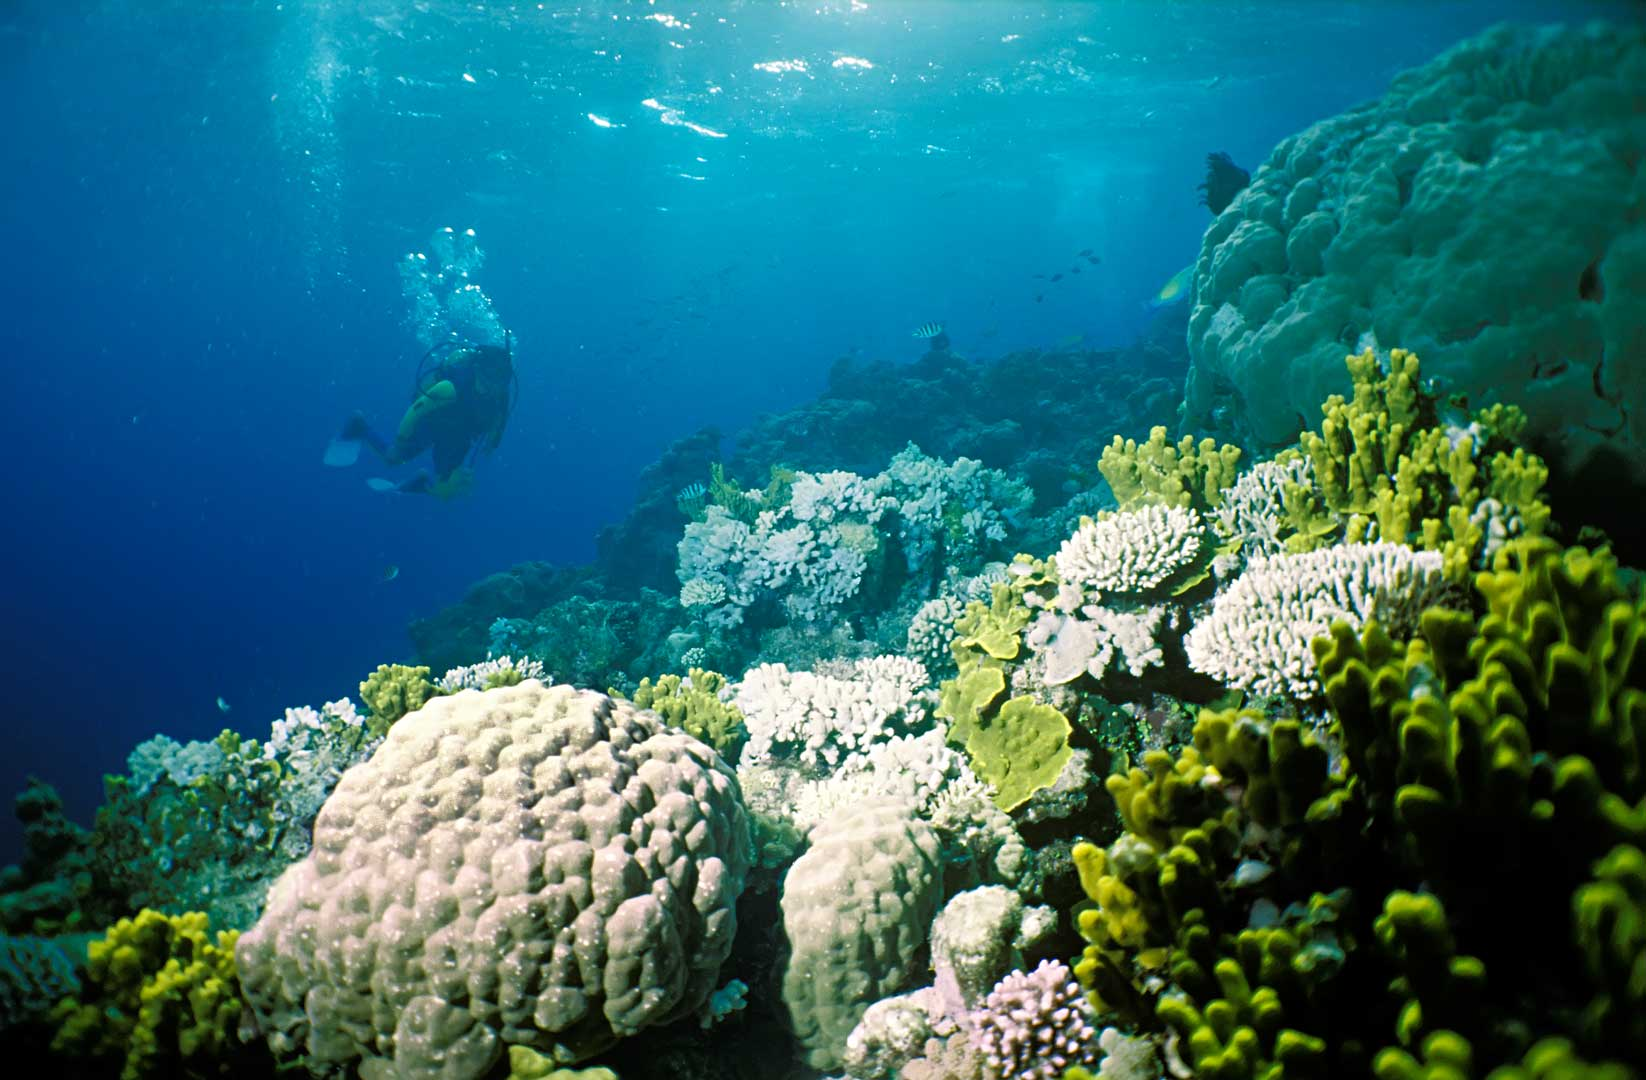 Diving, Great Barrier Reef, Australia